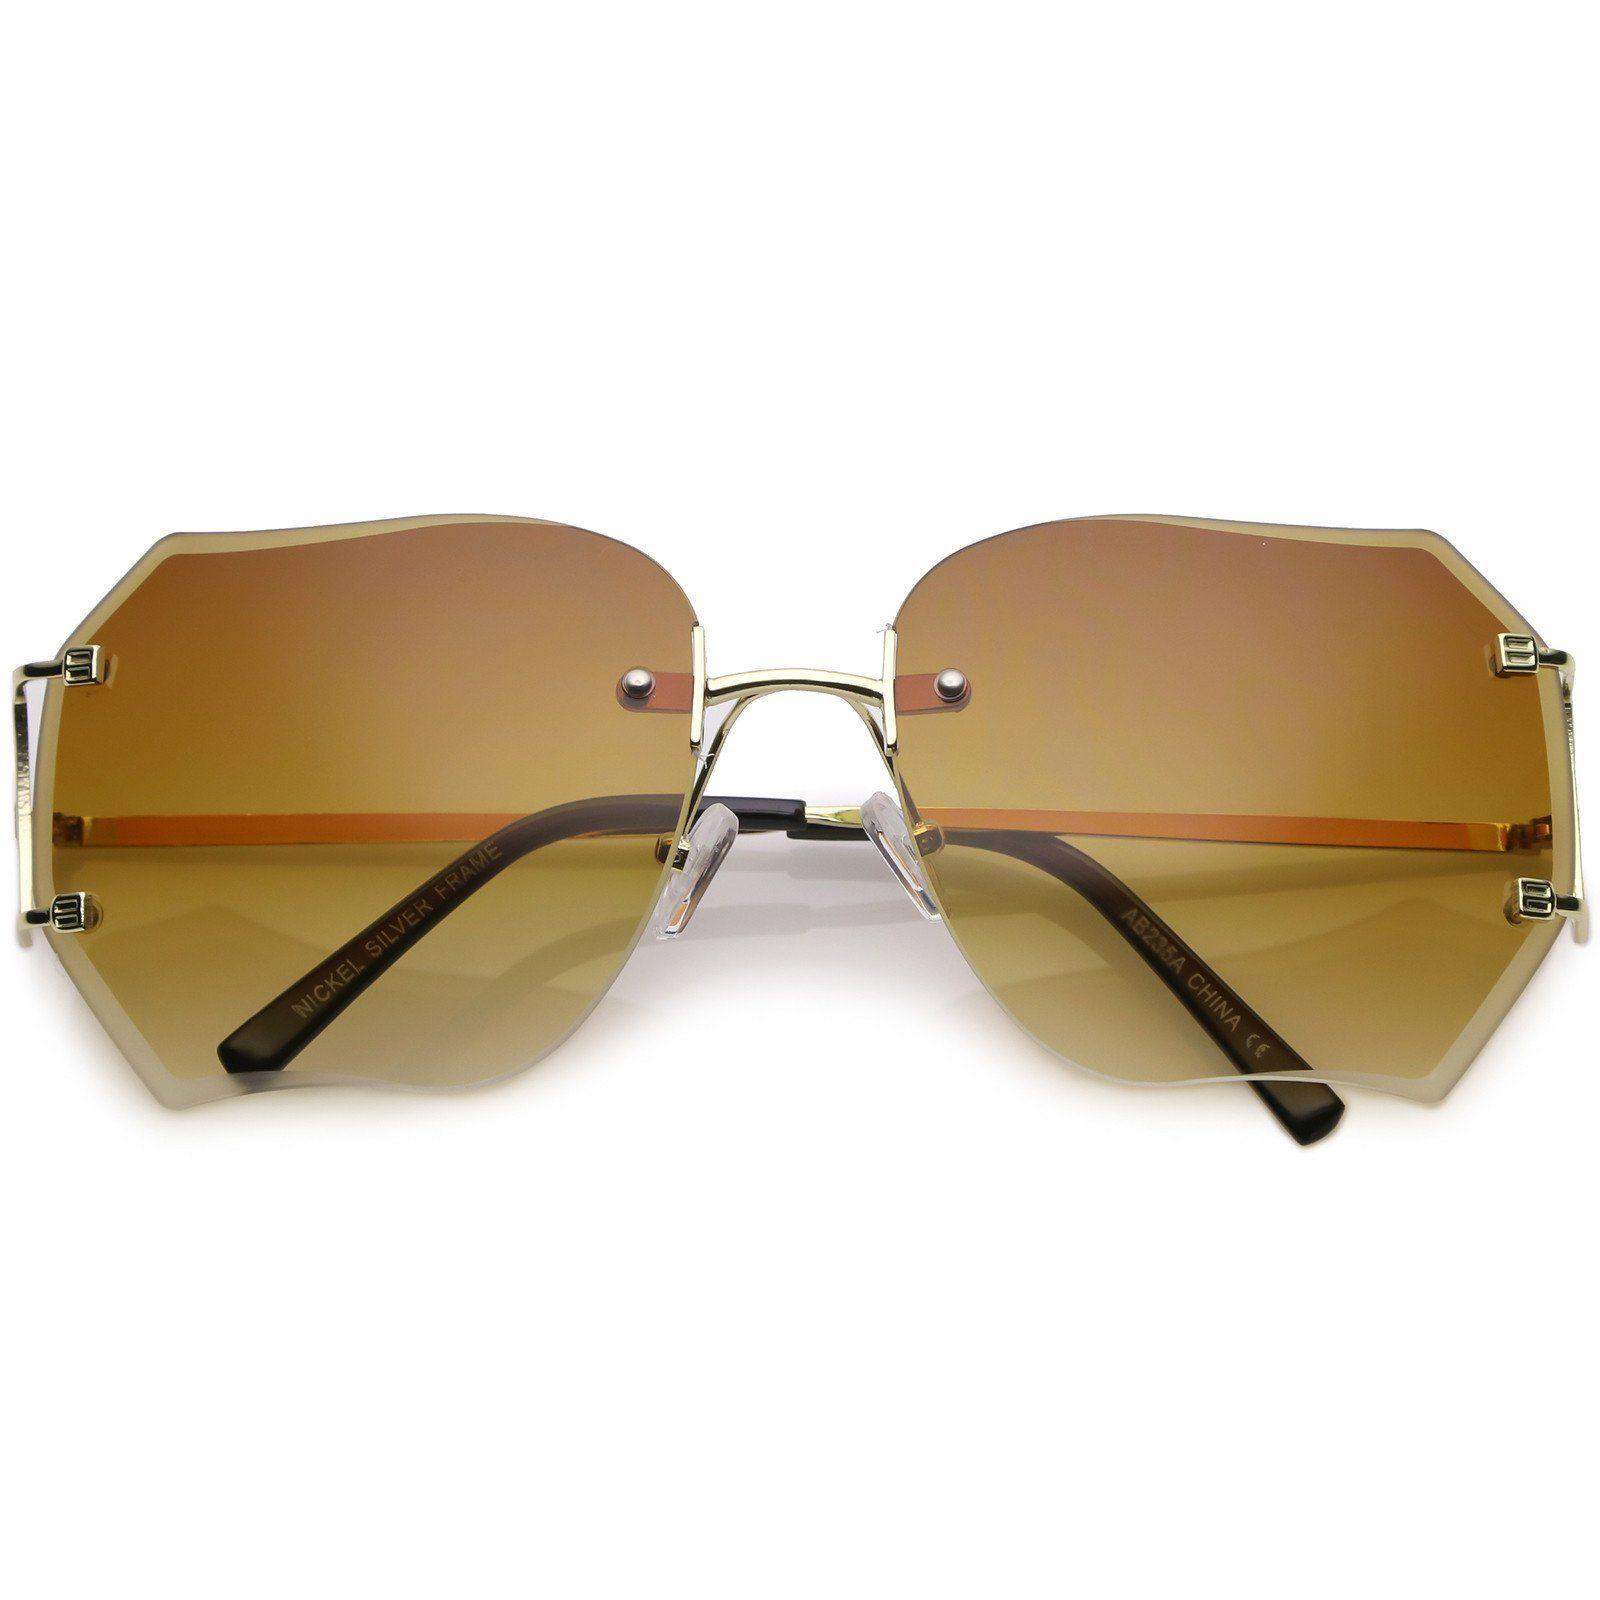 11330e3726 Oversize Rimless Square Sunglasses Slim Metal Arms Beveled Gradient Lens  61mm  sunglasses  sunglass  frame  summer  purple  sunglassla  clear  bold   cateye ...